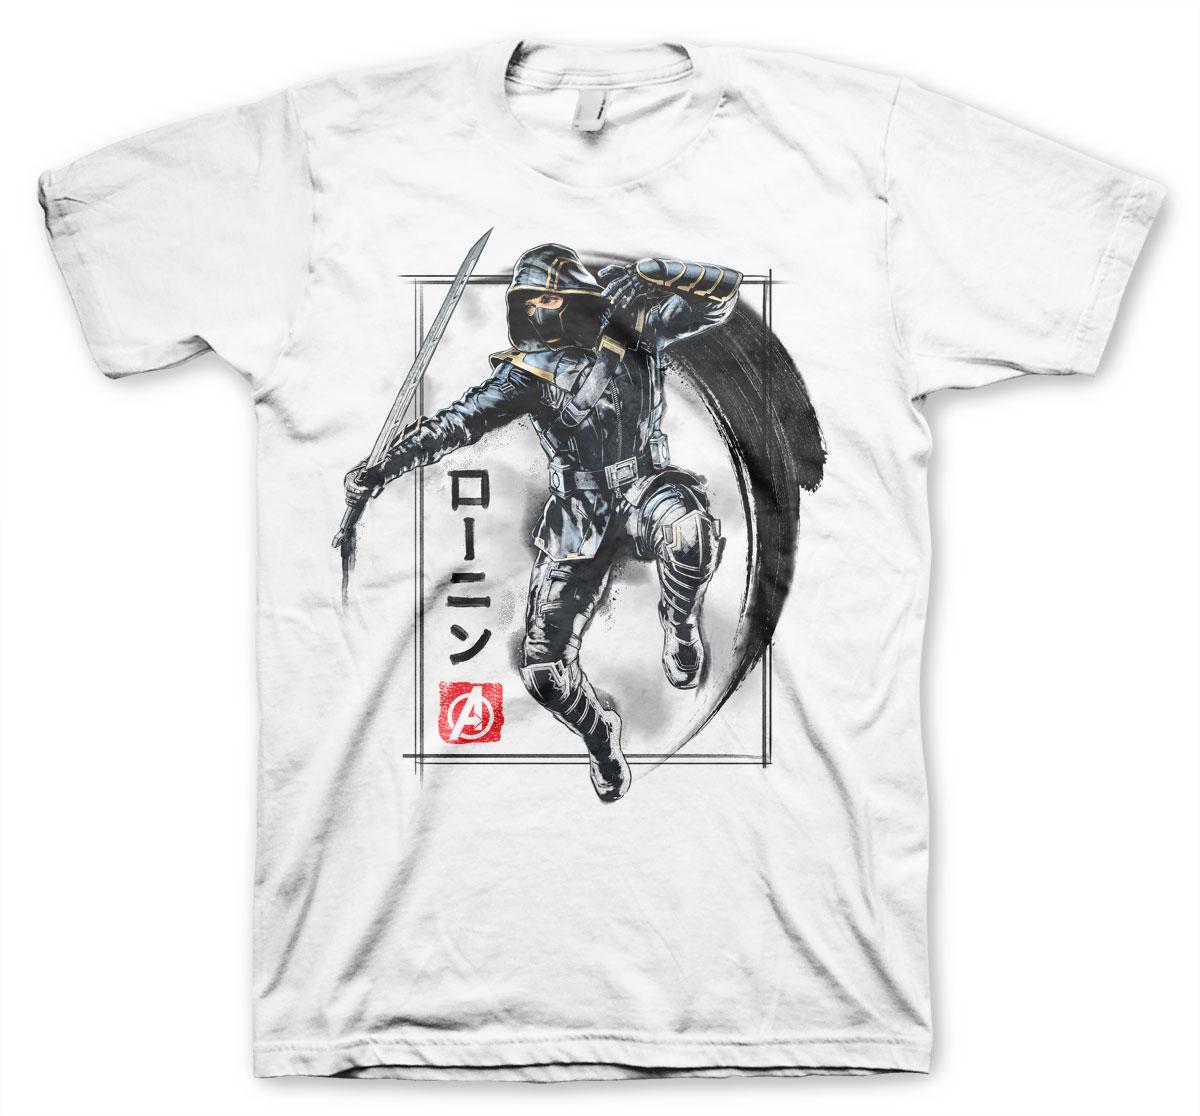 avengers-endgame-ronin-hawkeye-t-shirt